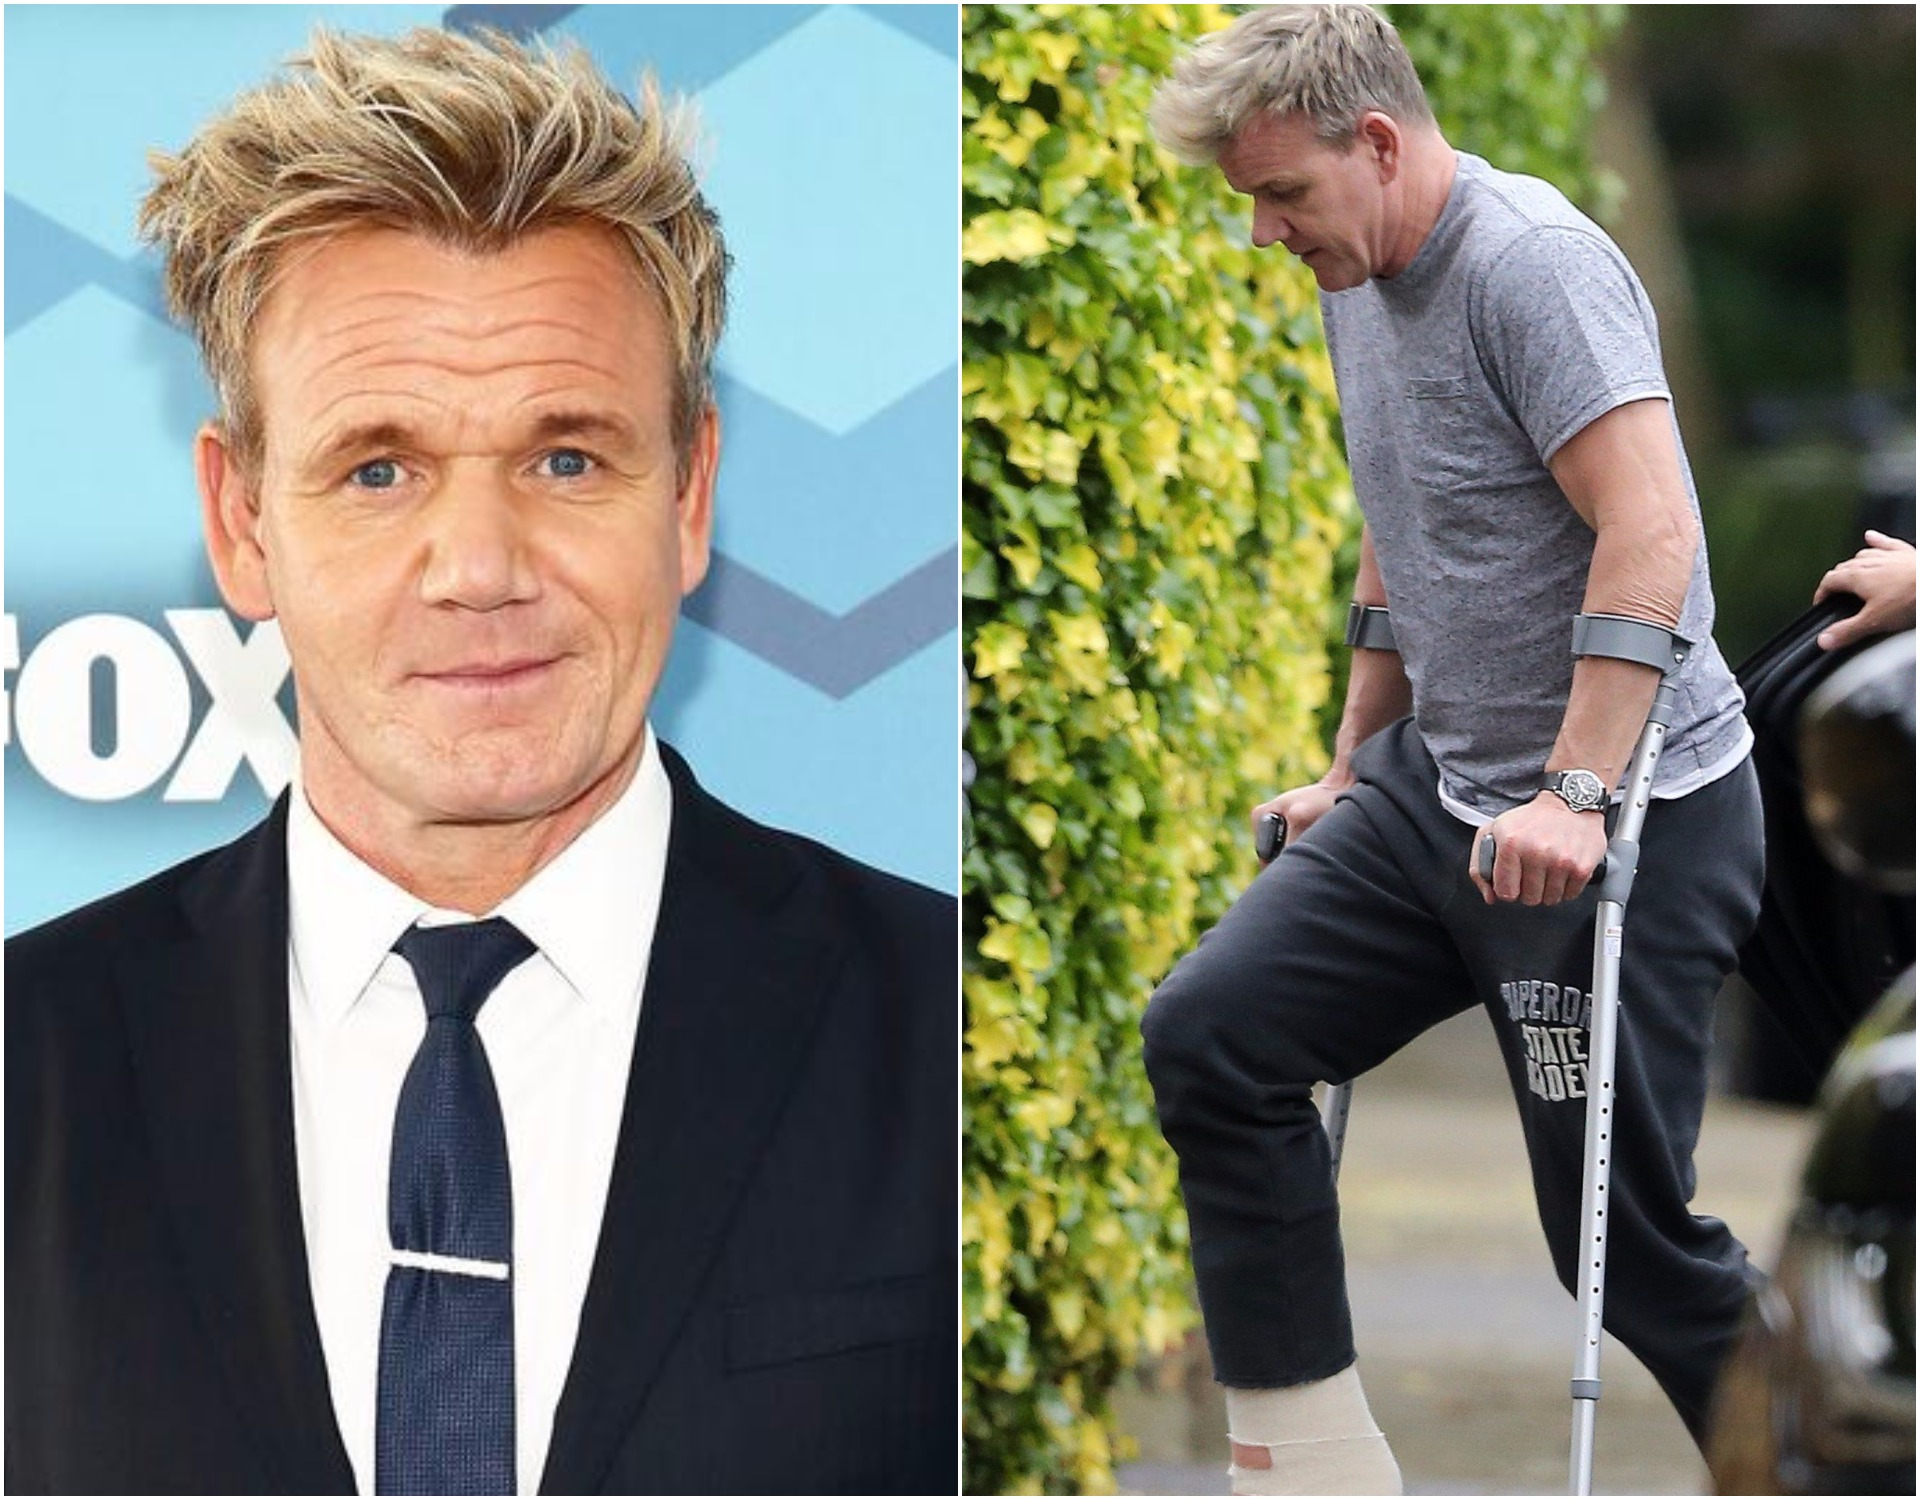 Gordon Ramsay hobbles home on crutches following Achilles tendon surgery